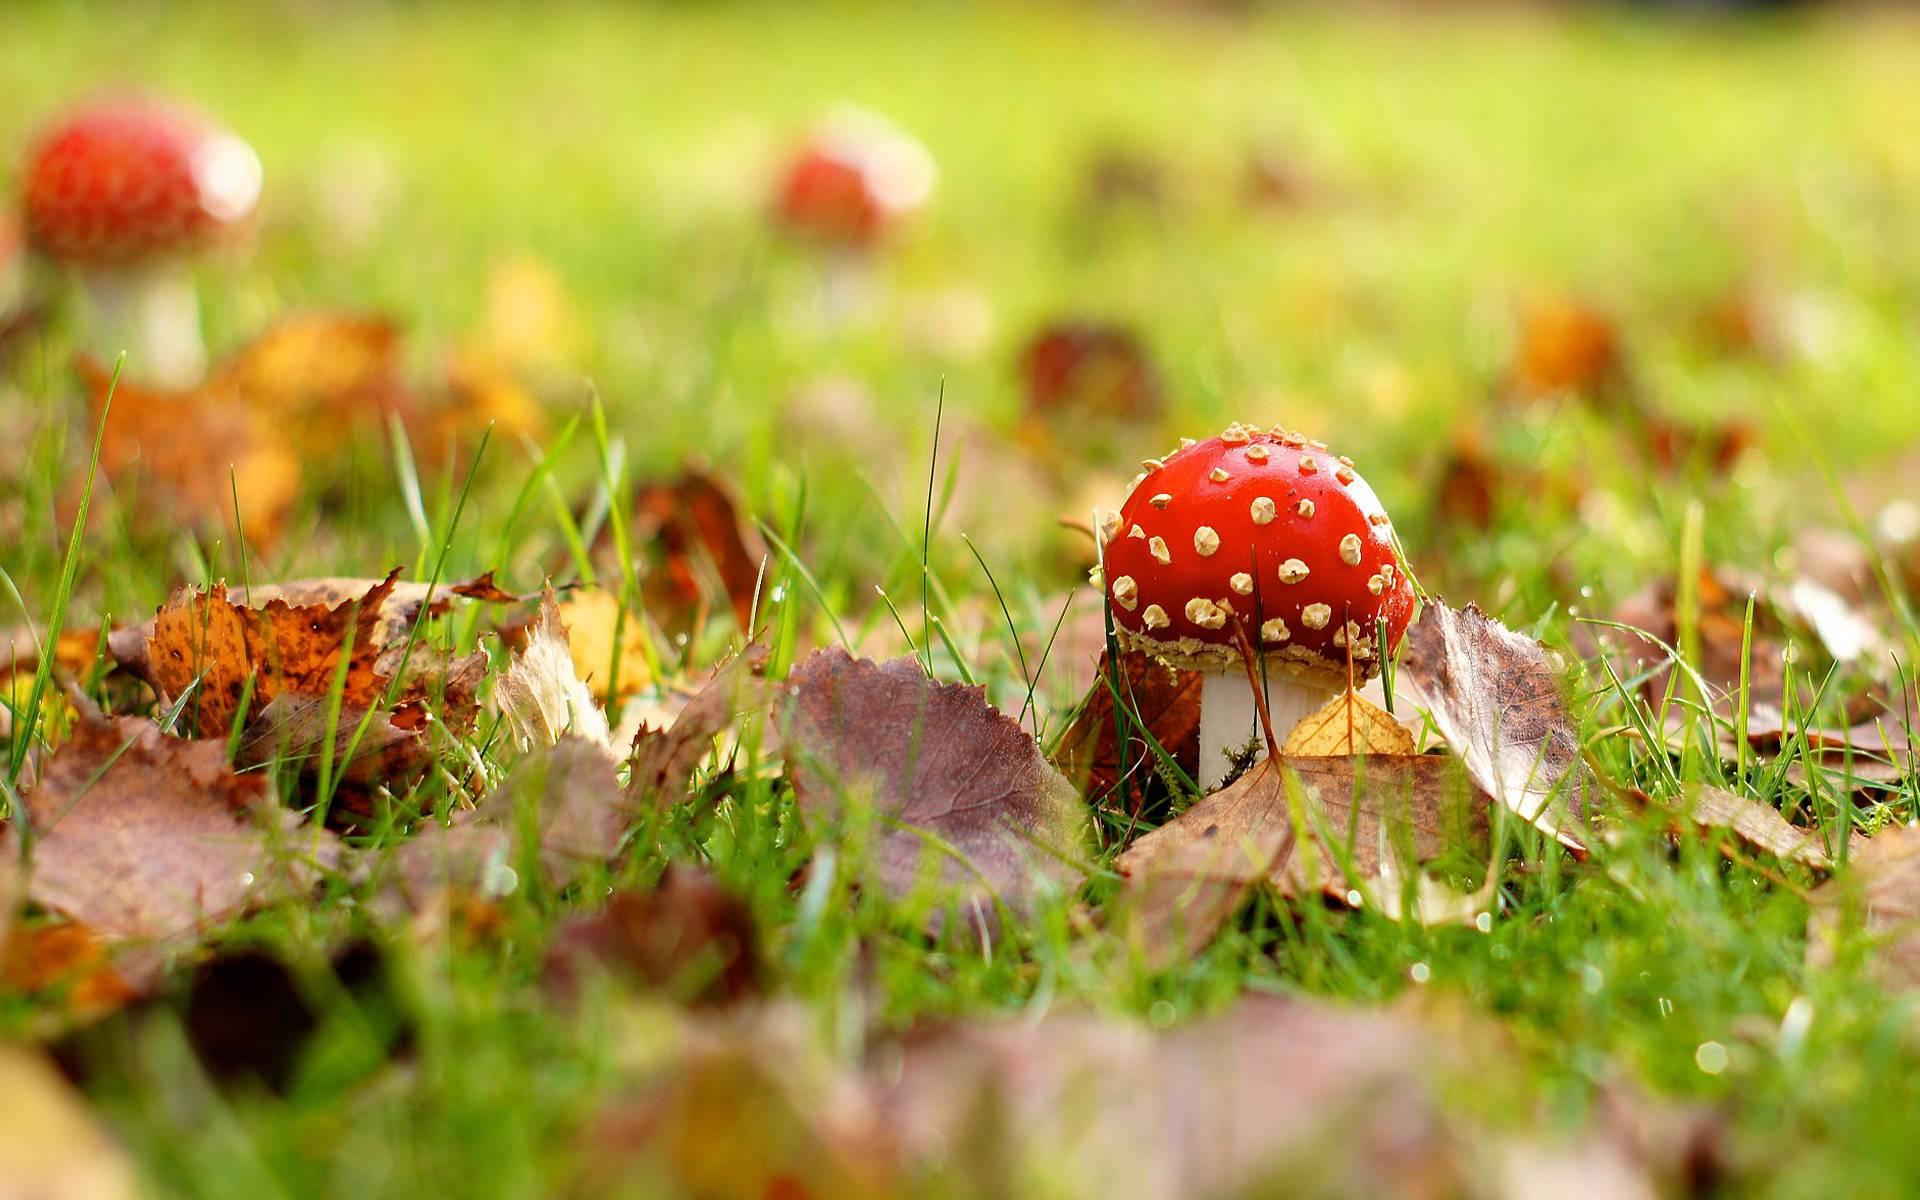 animated mushroom pictures